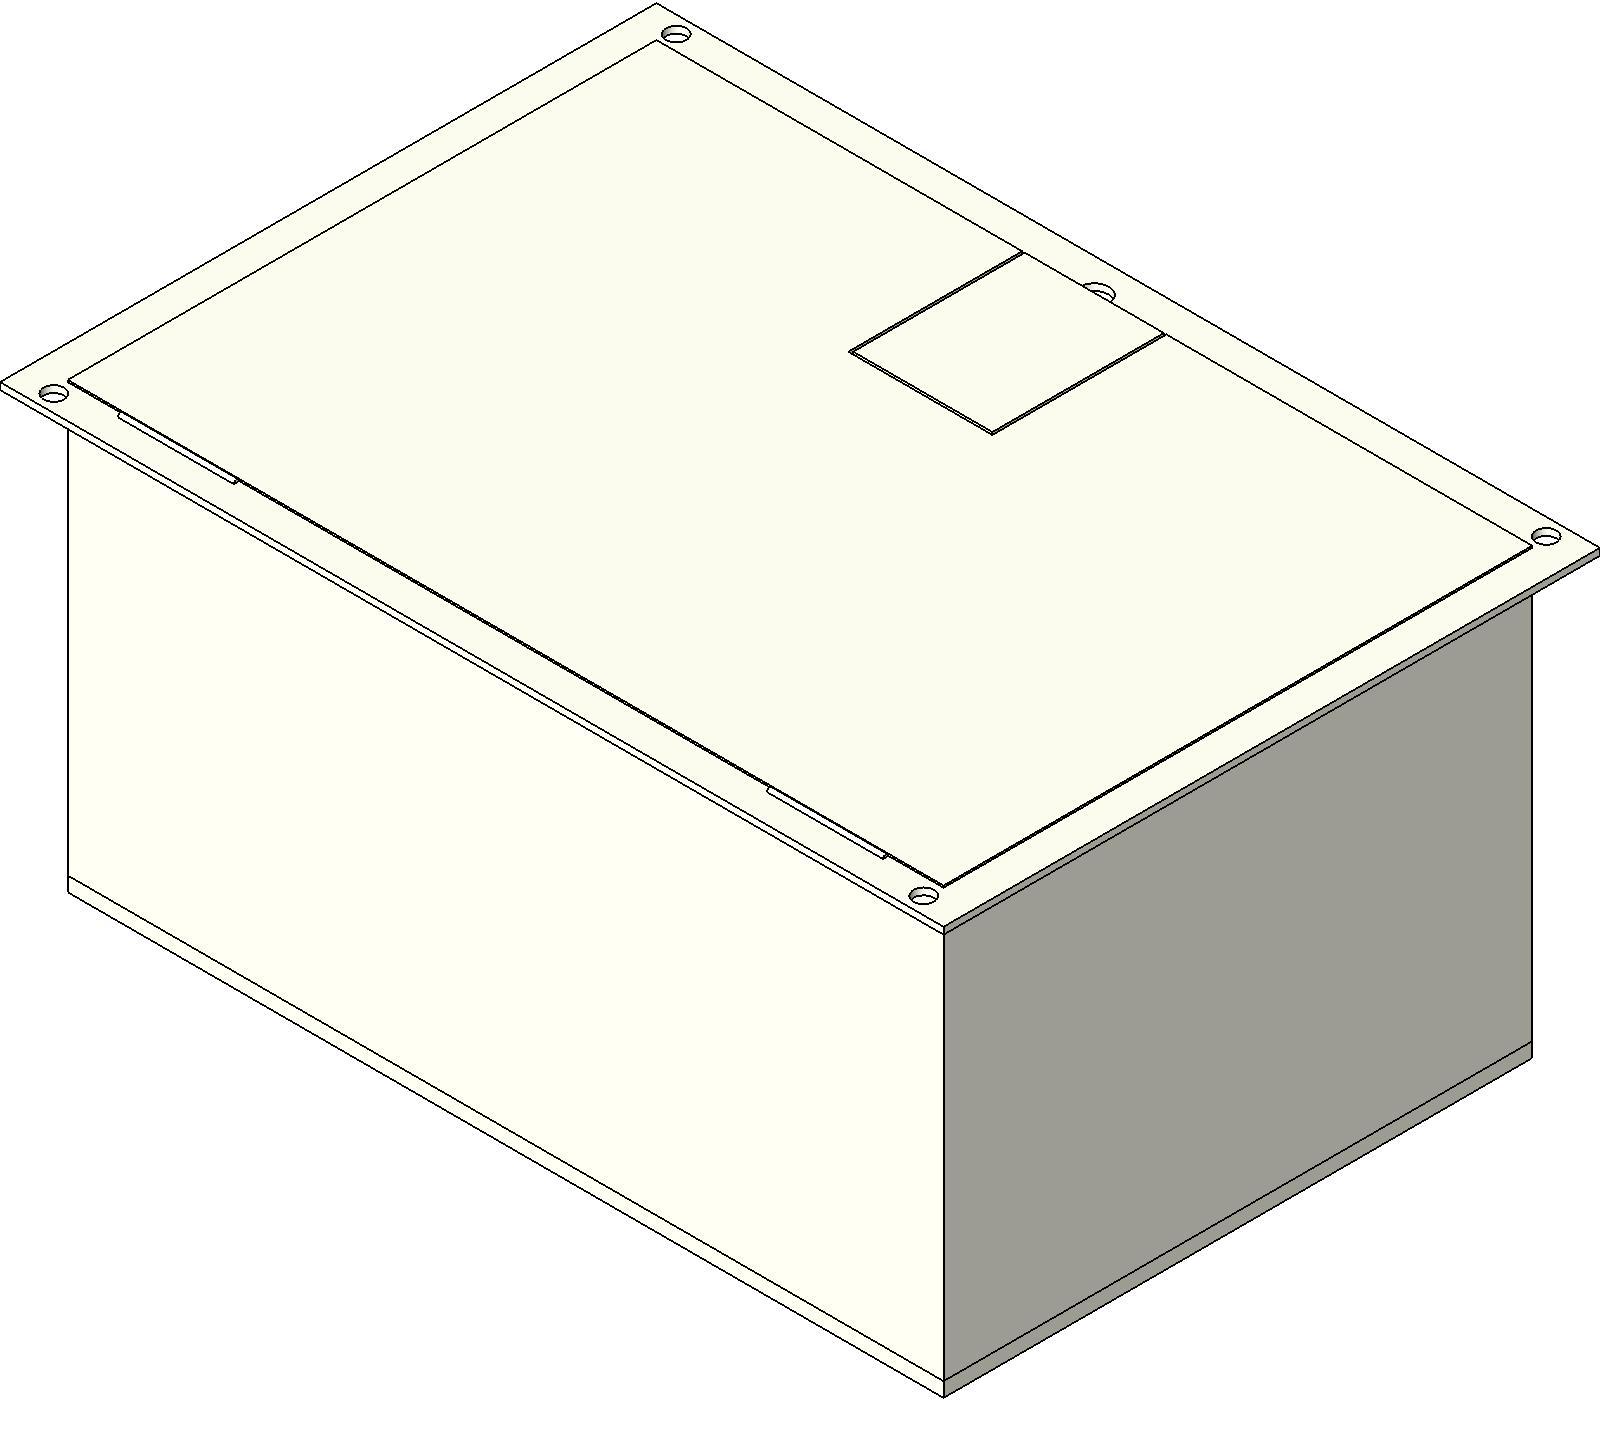 Electrical Box_FSR_FL1500 2D bim objects families electrical devices electrical boxes  at creativeand.co